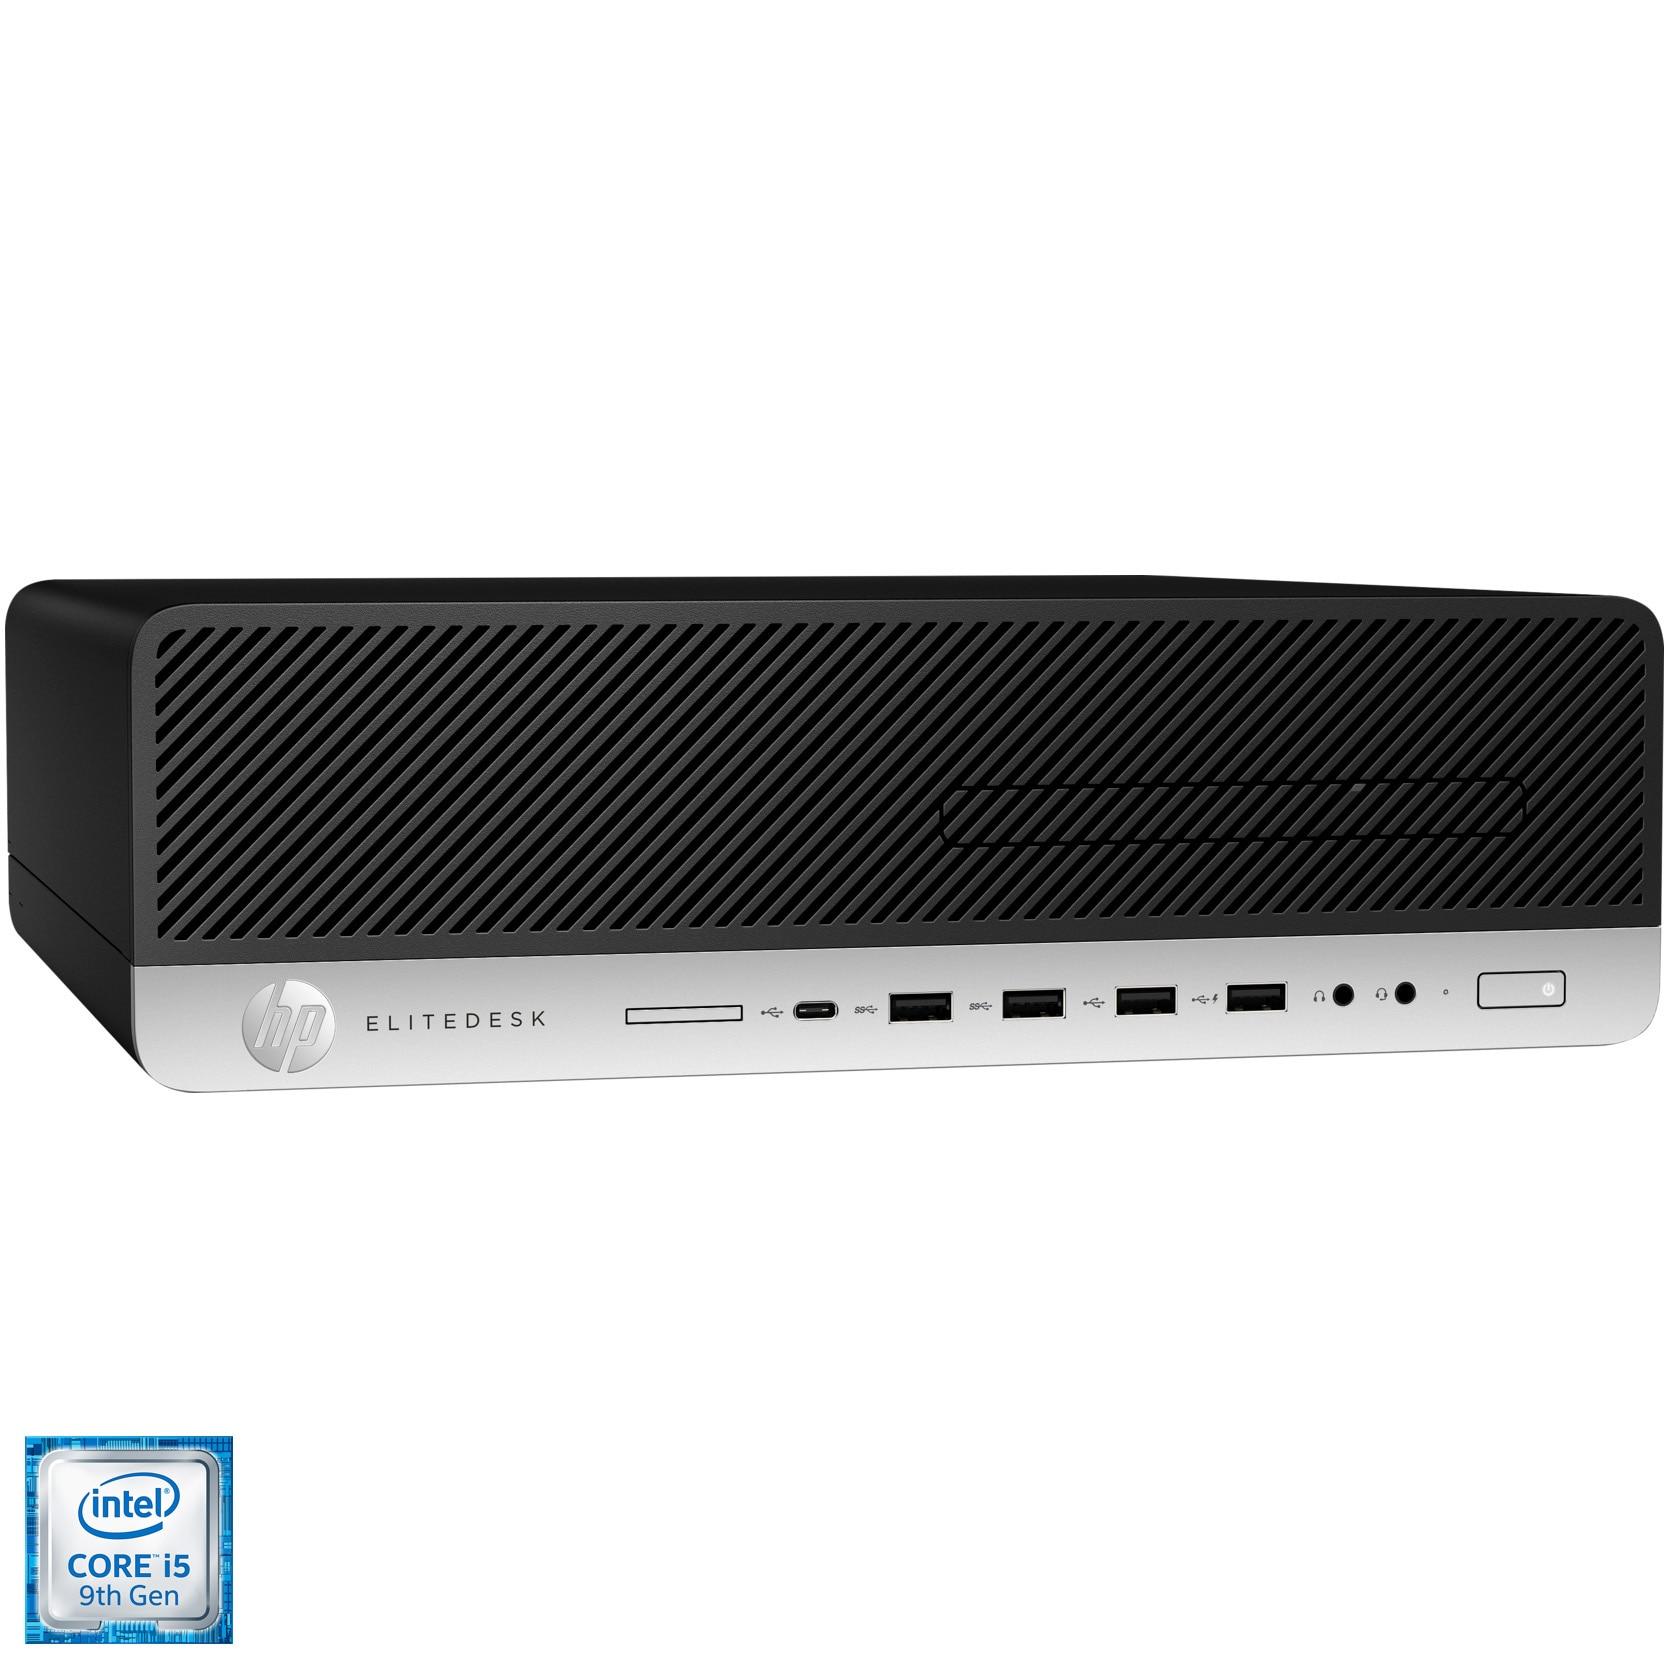 Fotografie Sistem Desktop PC HP EliteDesk 800 G5 SFF cu procesor Intel® Core™ i5-9500 pana la 4.40 GHz, Coffee Lake, 8GB DDR4, 256GB SSD, Intel® UHD Graphics 630, Microsoft Windows 10 Pro